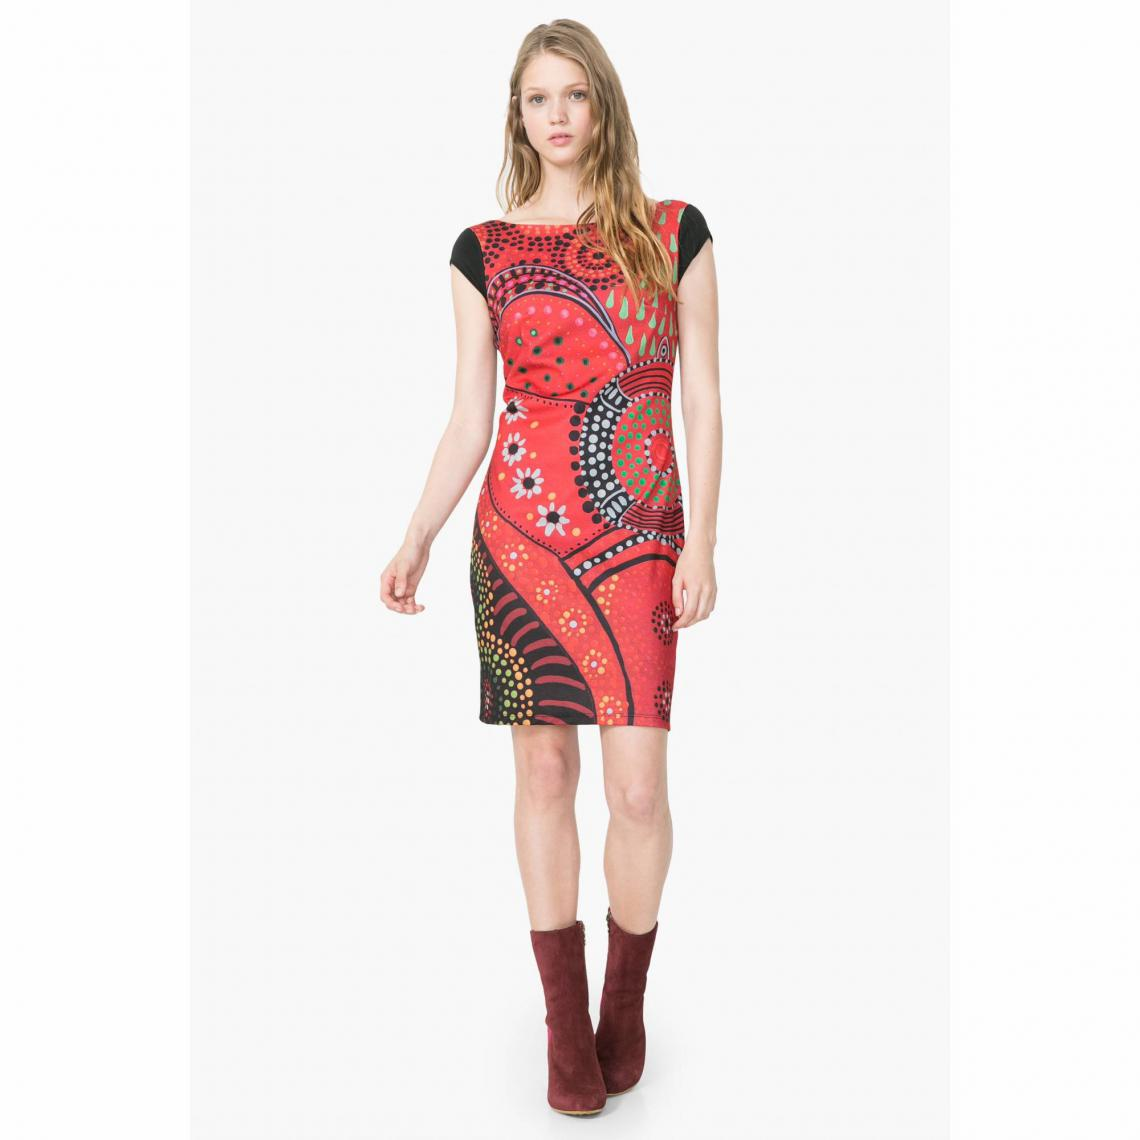 f3119c8472b Robe manches courtes imprimé multicolore femme Desigual - Rouge Desigual  Femme